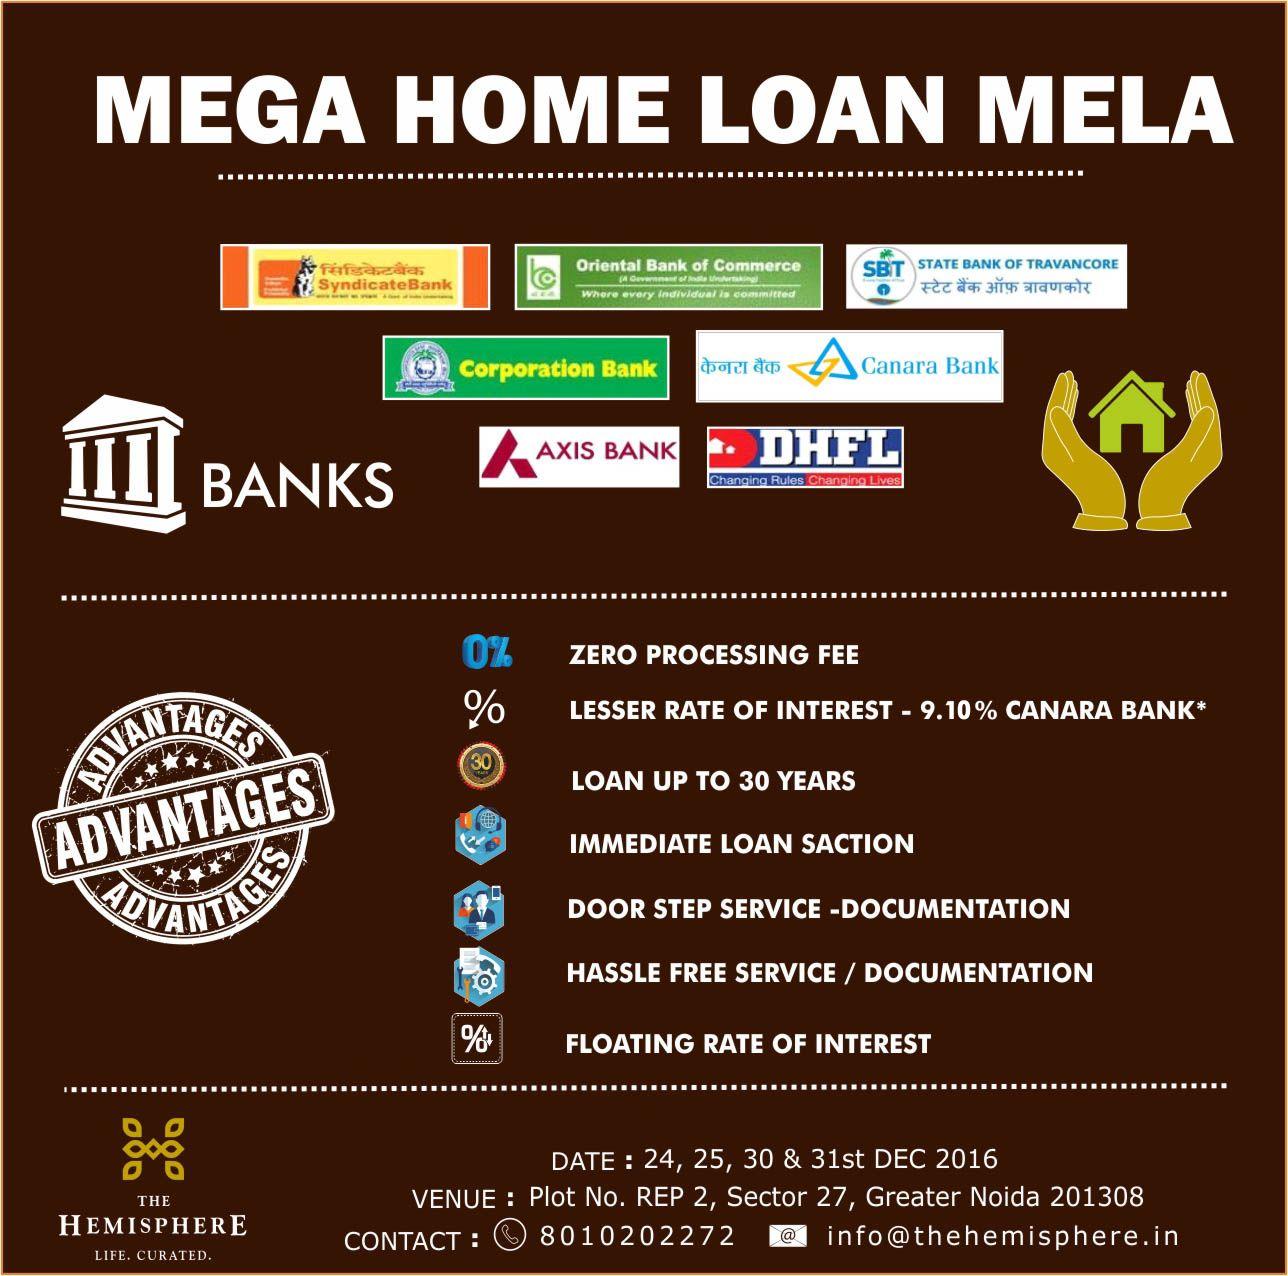 Thehemisphere Mega Home Loan Mela Near Parichowk Greaternoida Date 24 25 30 31 Dec 2016 Venue Plot No Rep 2 Sec 27 Home Loans Bank Loan Mela